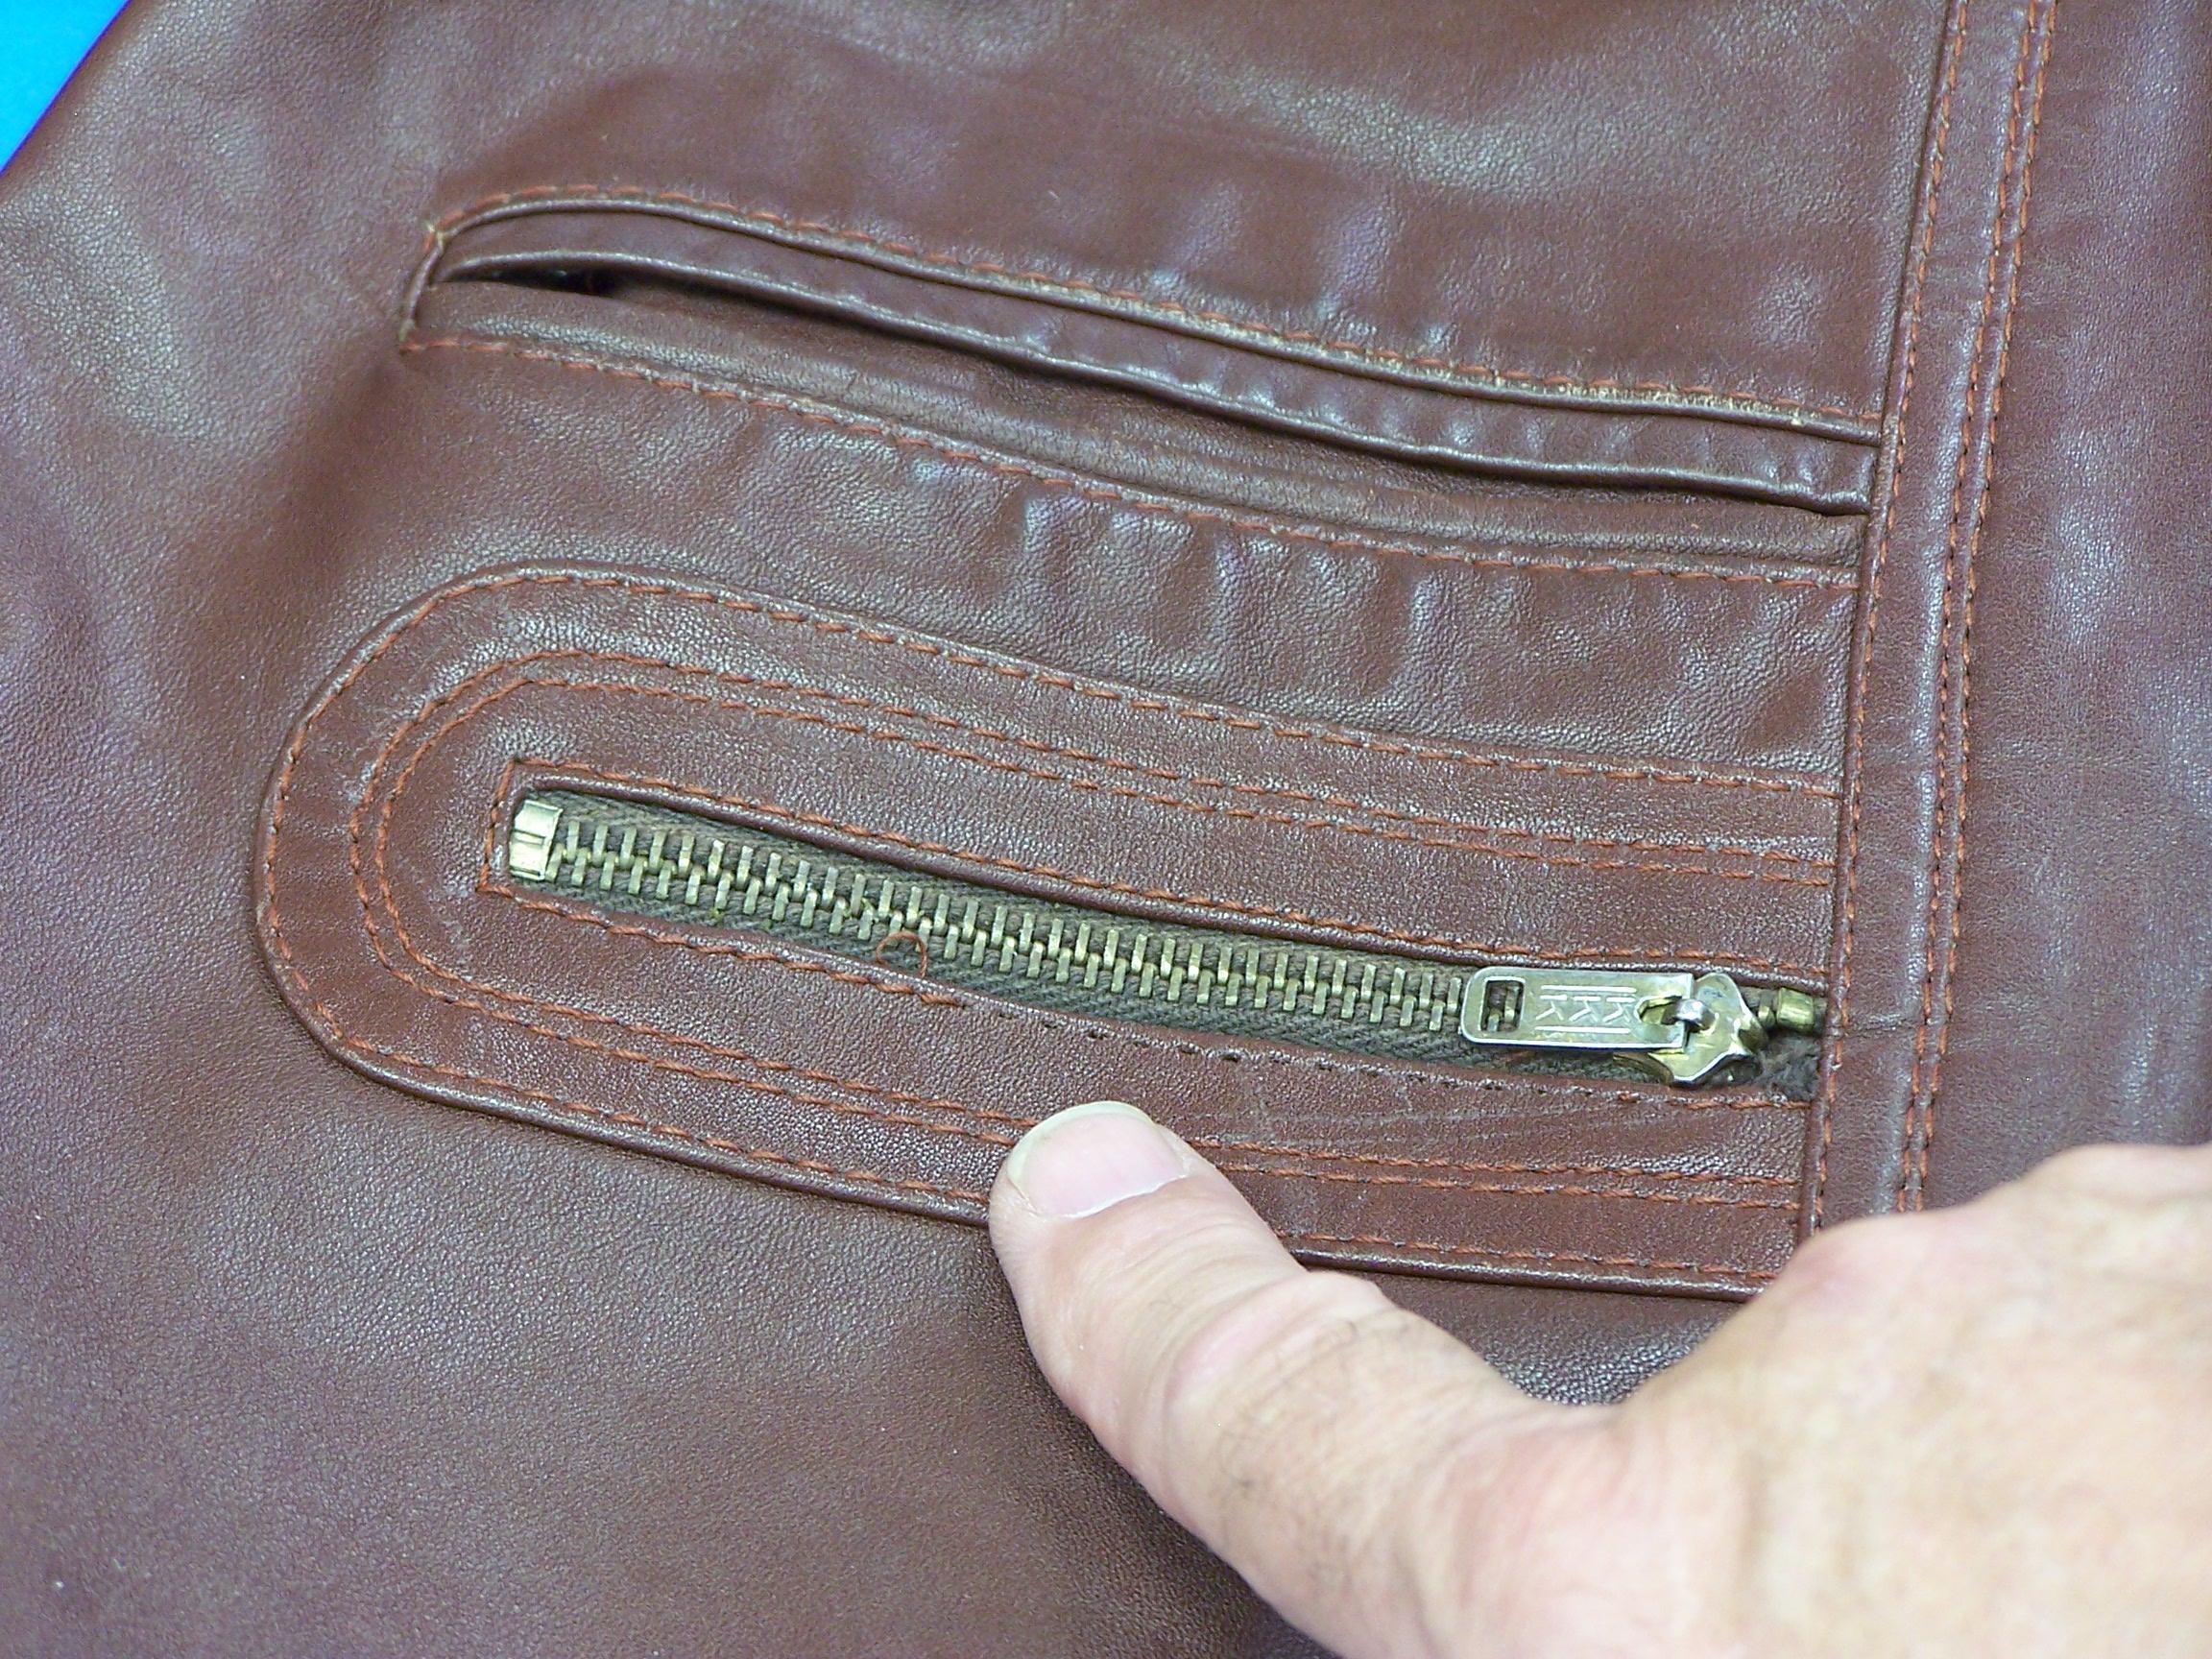 Leather jacket zip repair - View Larger